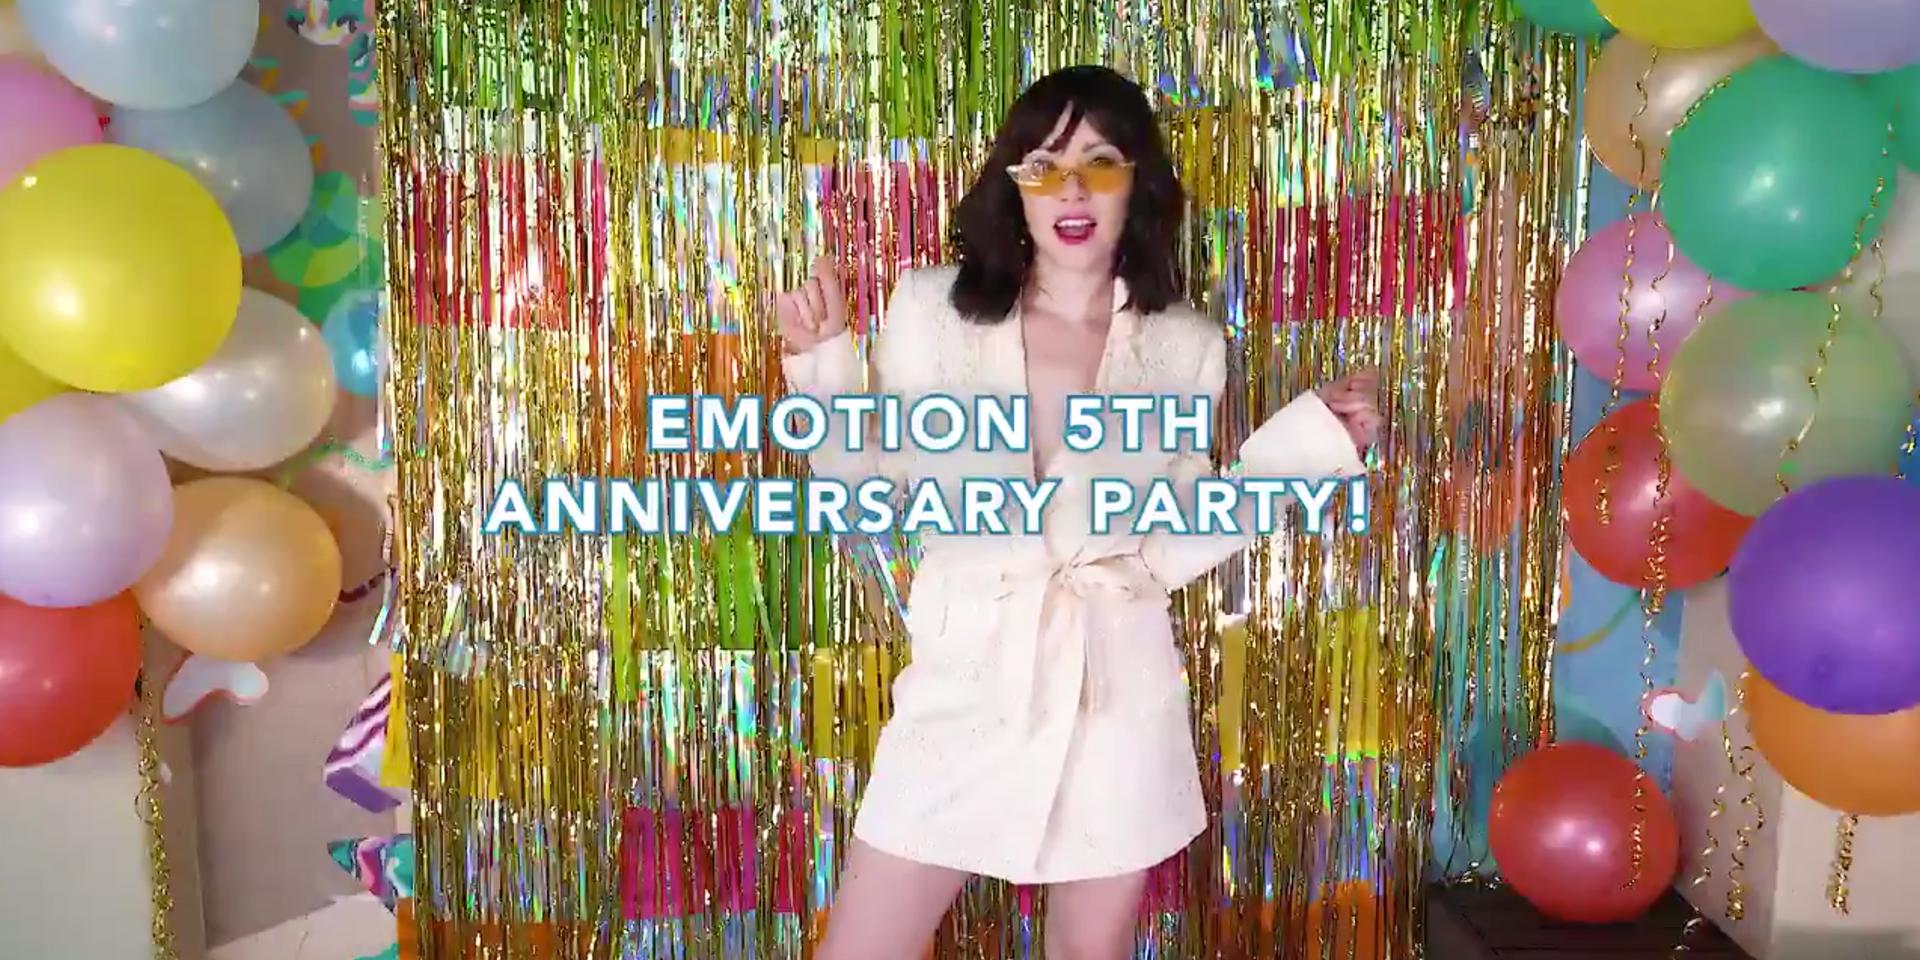 Carly Rae Jepsen announces EMOTION karaoke party, unveils anniversary merch